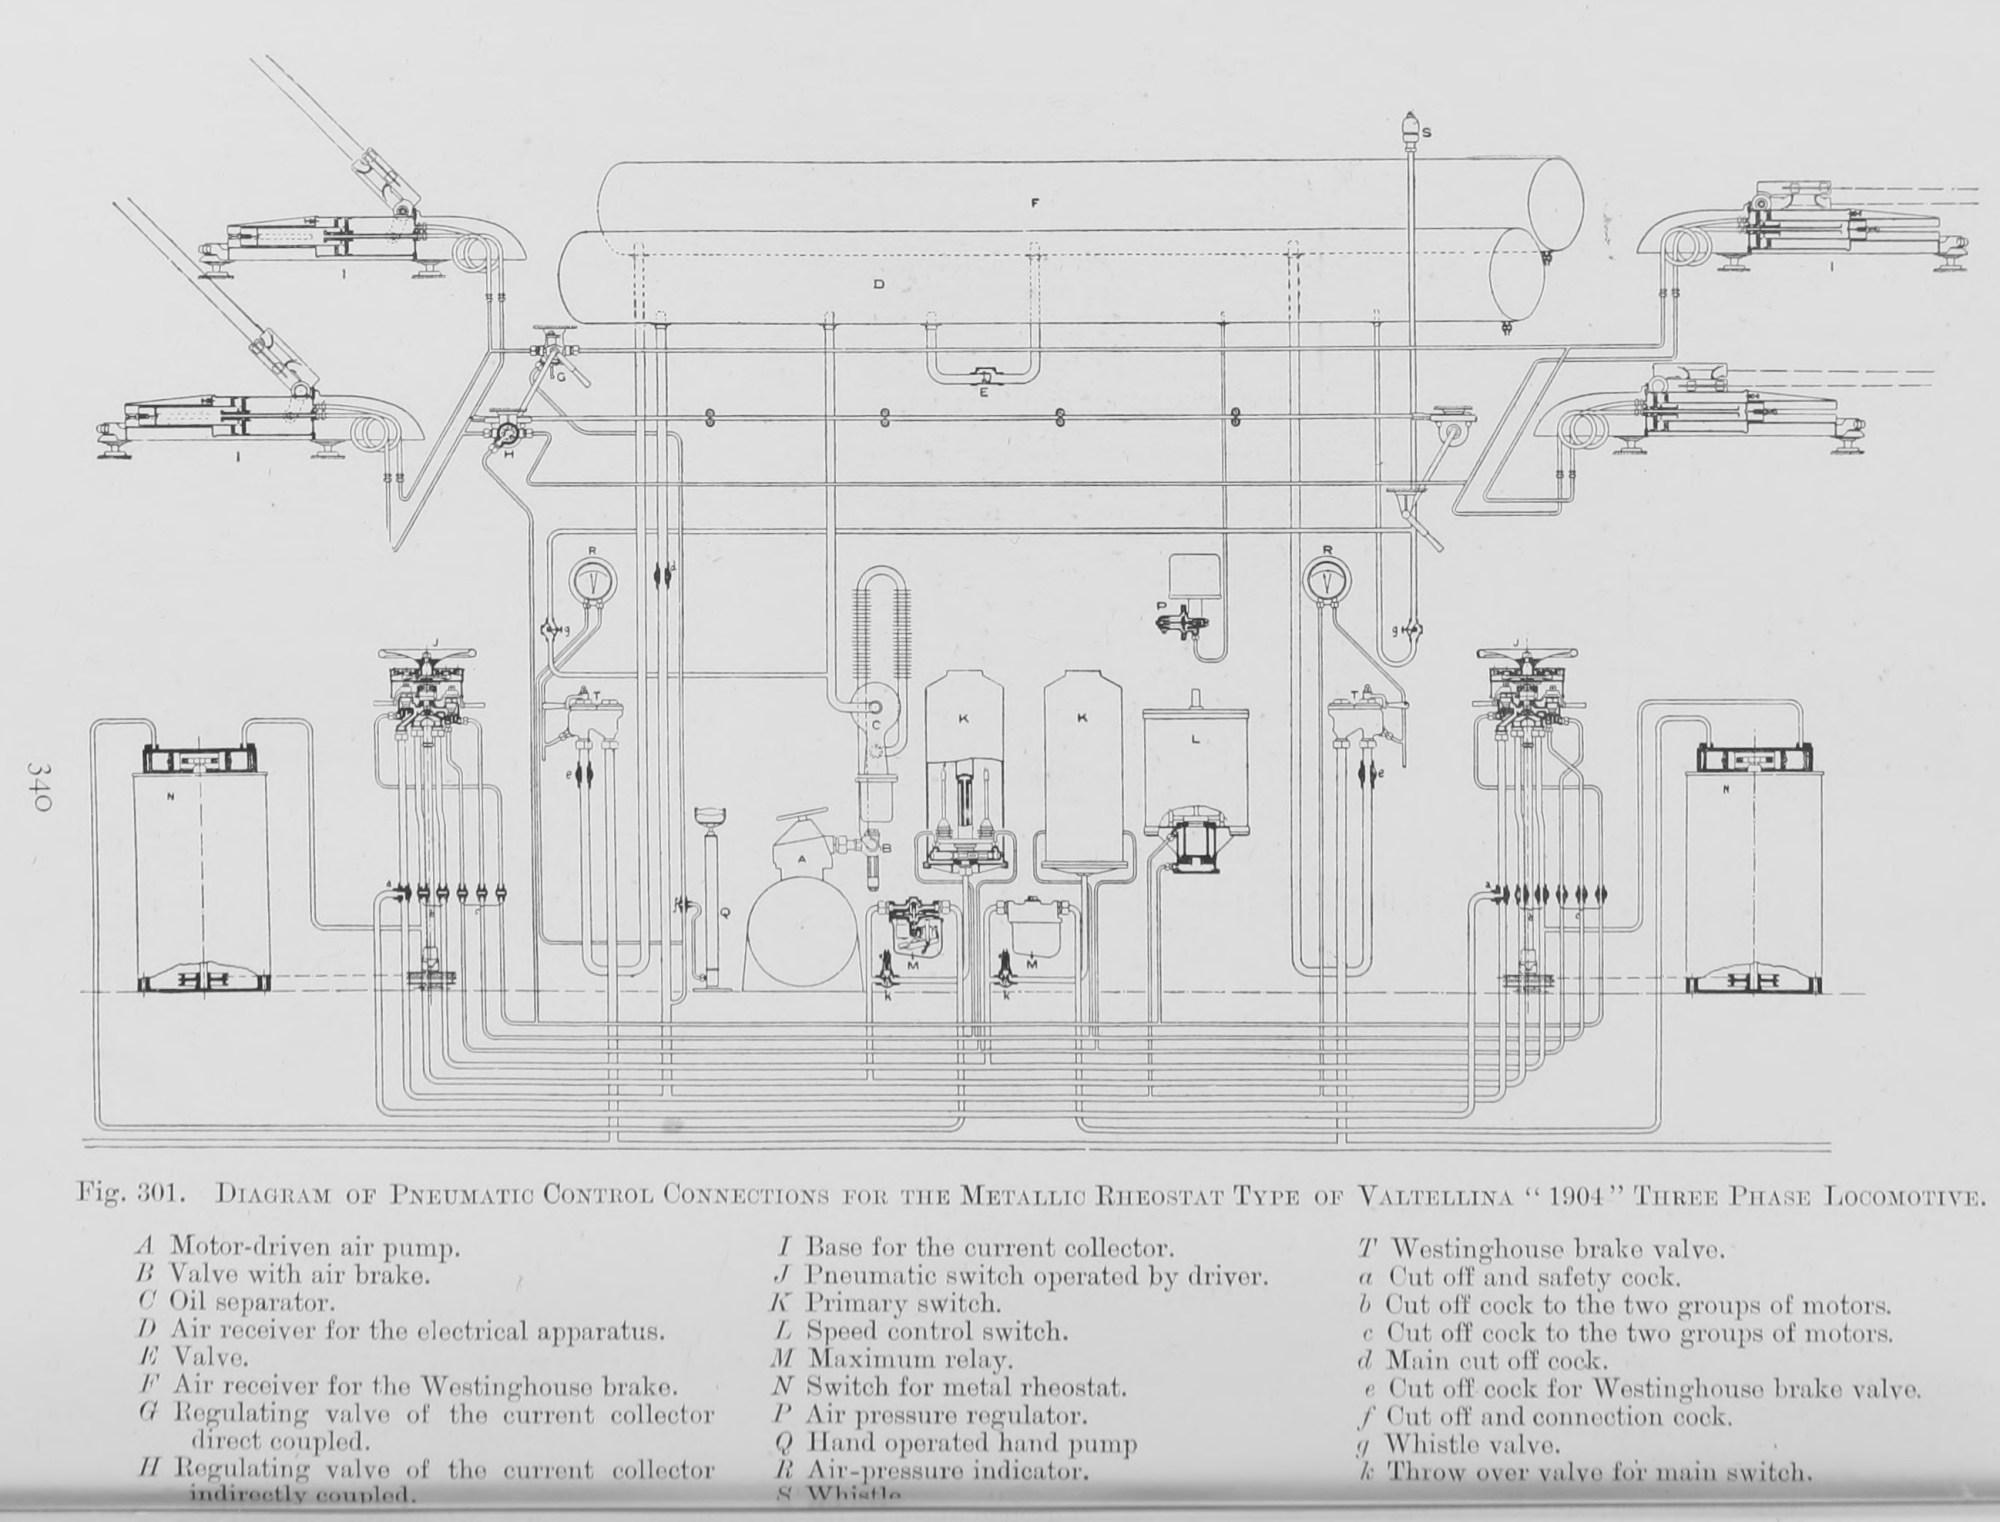 hight resolution of  1904 valtellina locomotive pneumatic controls for metallic rheostat diagram